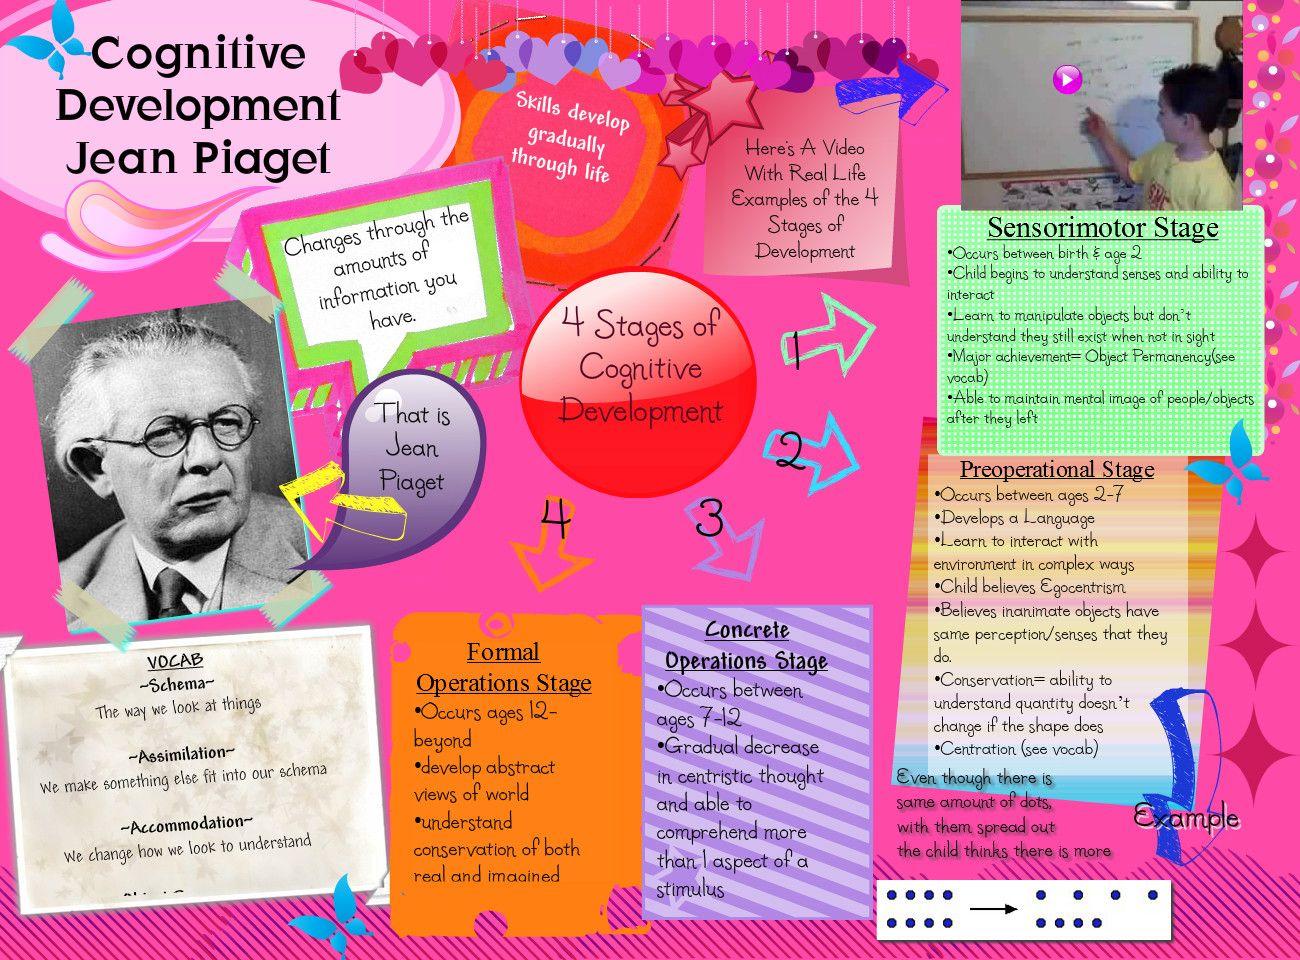 Piaget Developmental Stages Jean Piaget Cognitive Development Cognitive Development Activities Jean piagets stages of cognitive development chart